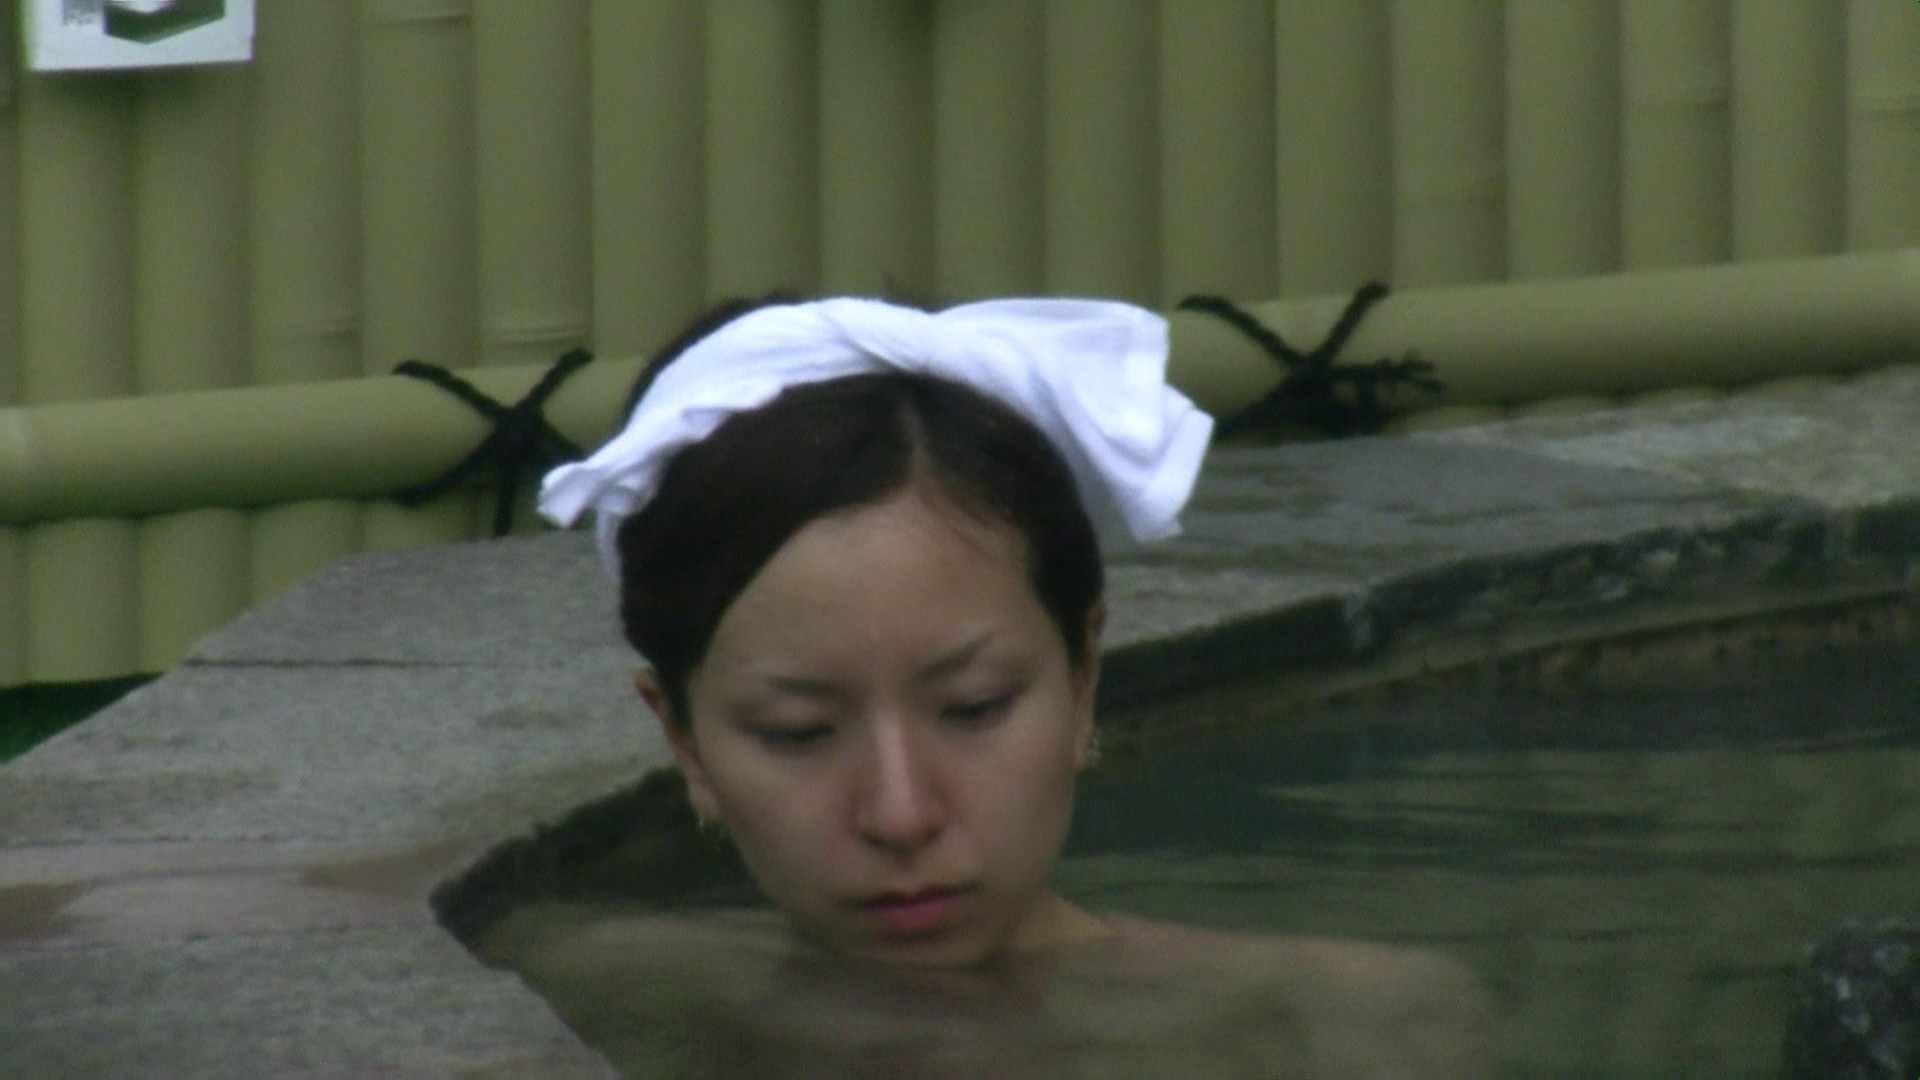 Aquaな露天風呂Vol.39【VIP】 綺麗なOLたち オマンコ動画キャプチャ 111枚 41